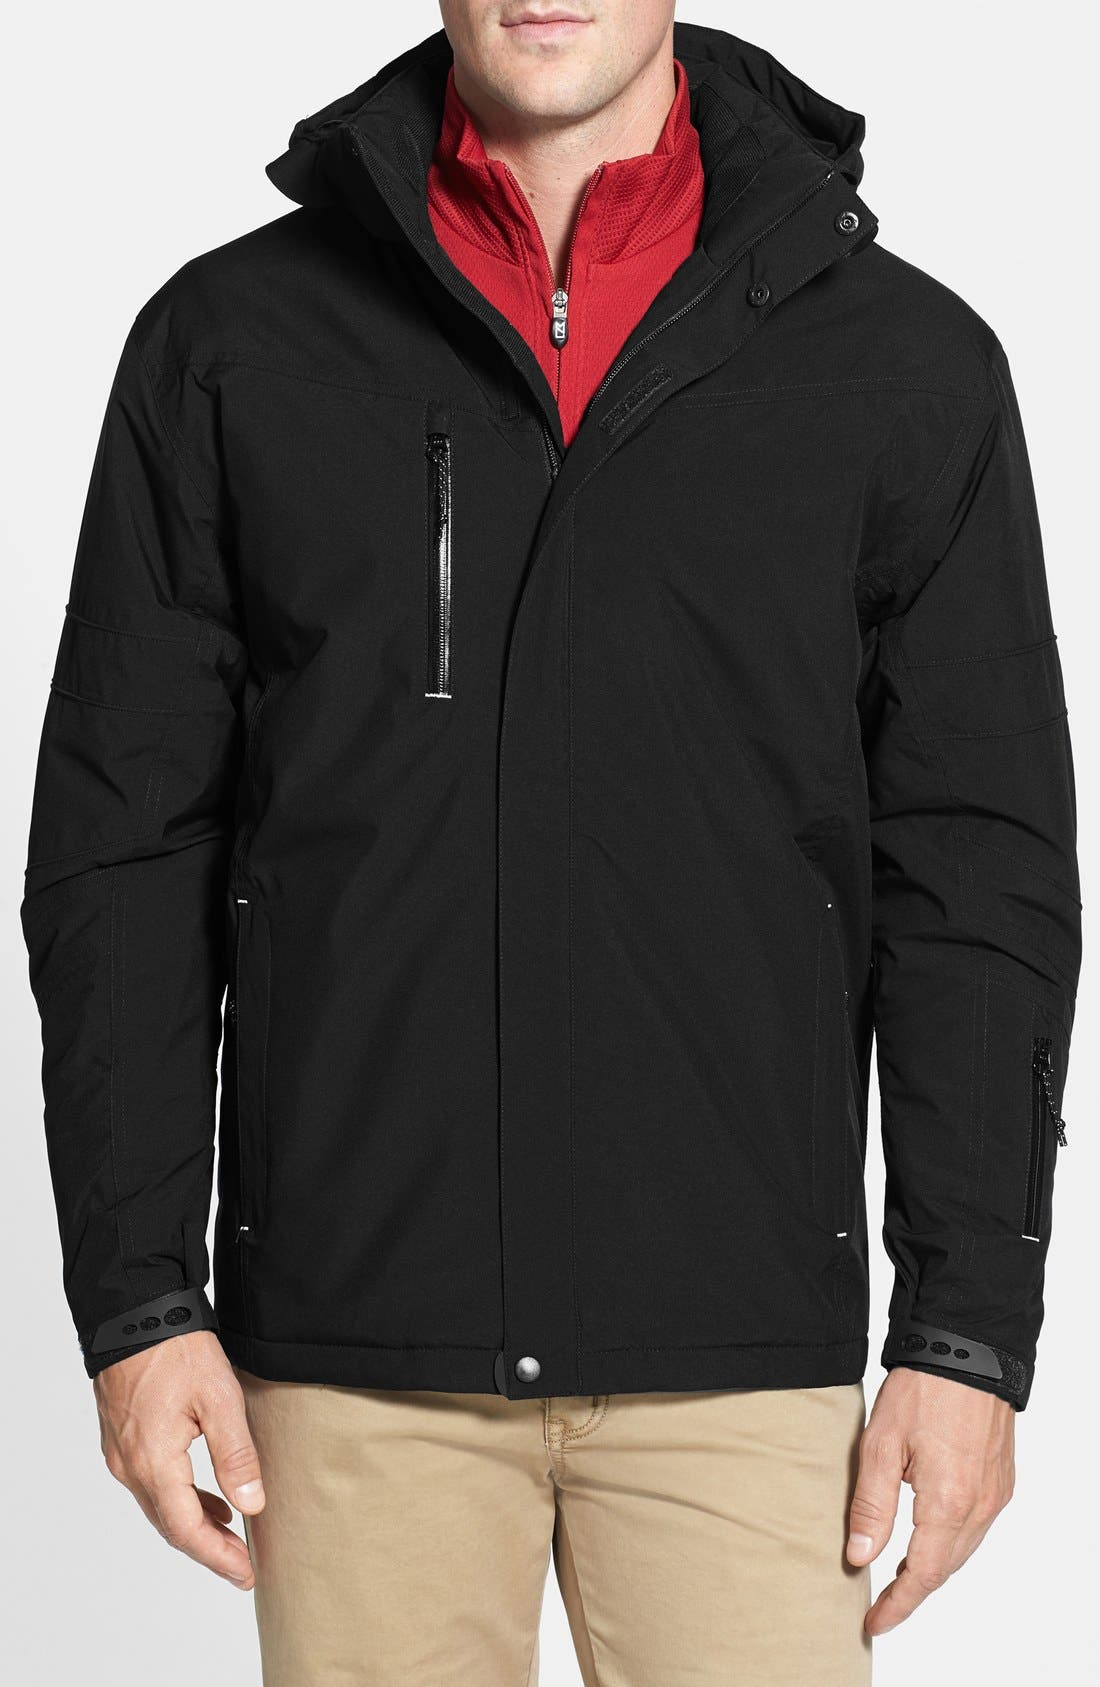 WeatherTec Sanders Jacket,                         Main,                         color, Black